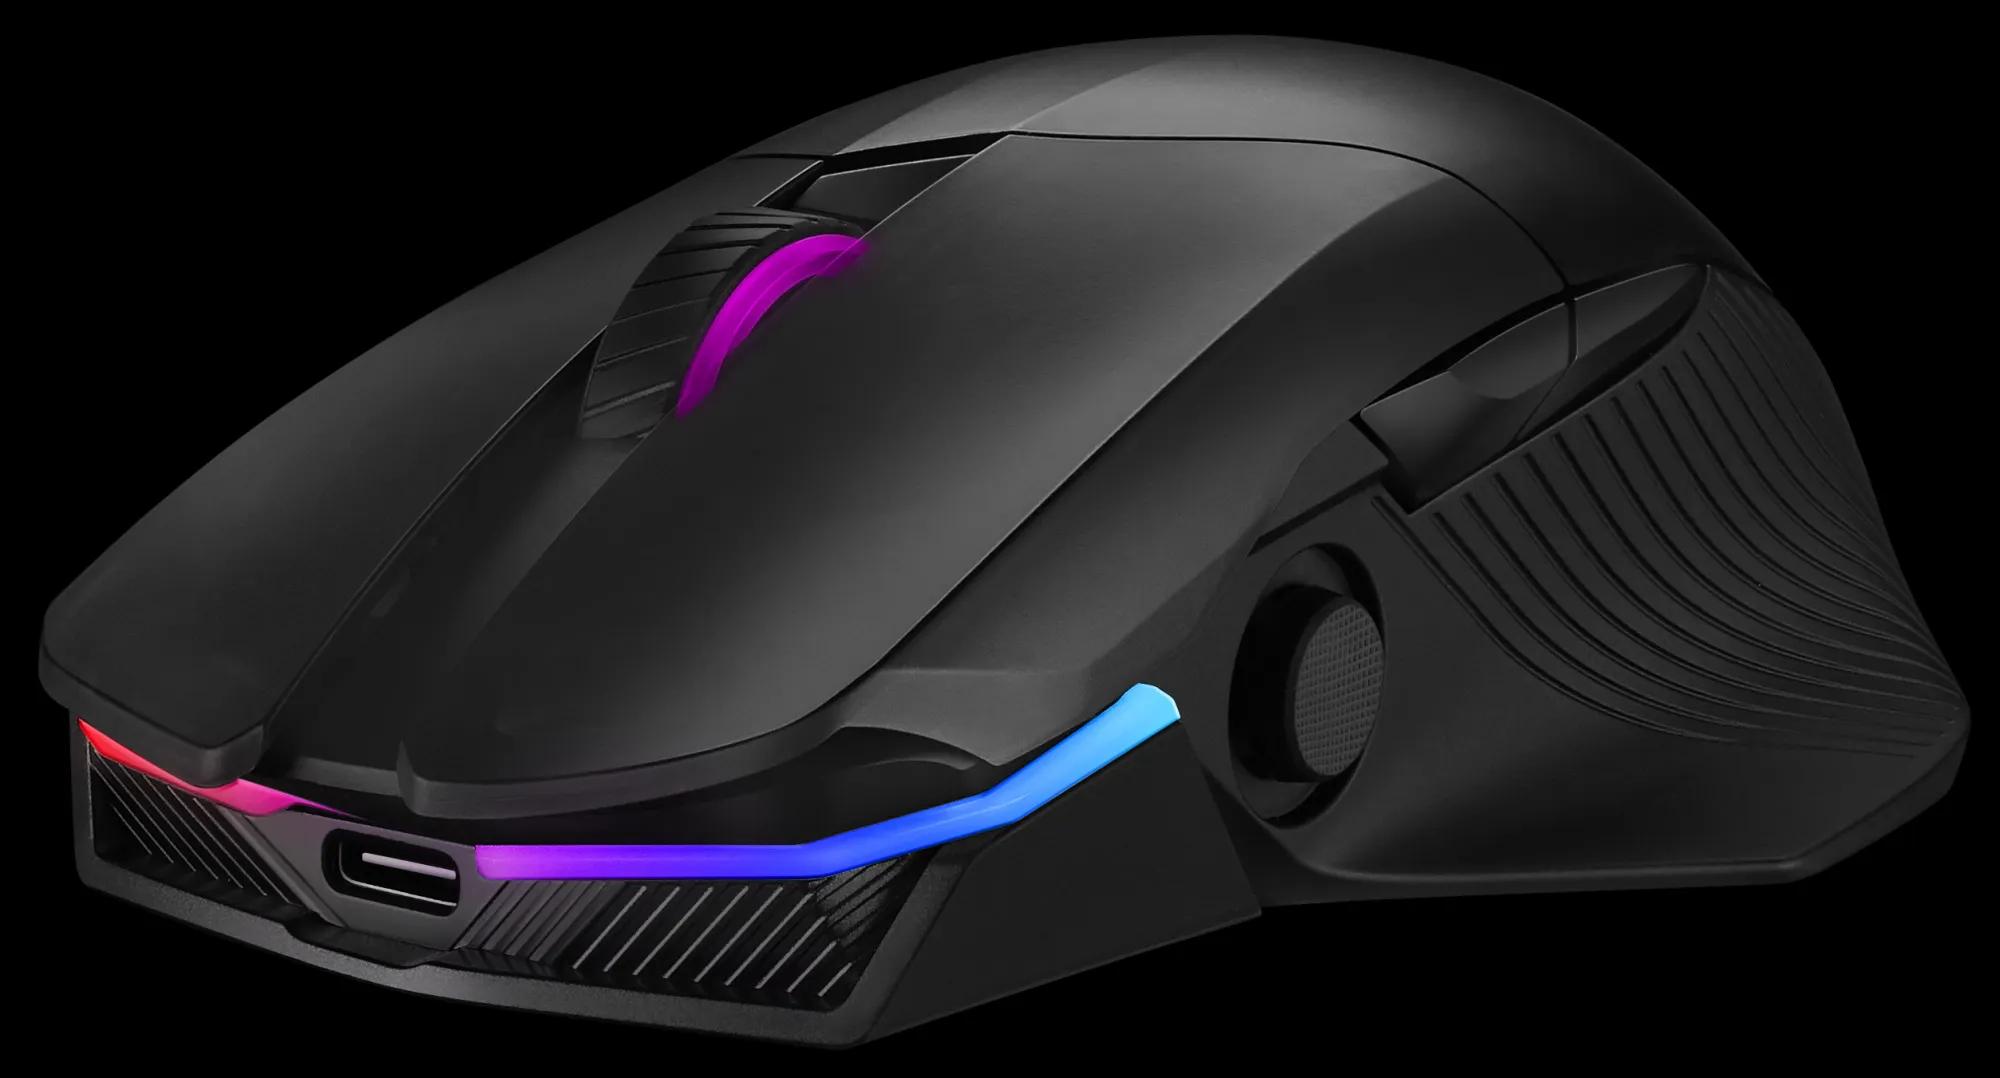 CES 2020: in arrivo Asus Chakram, nuovo mouse targato ROG 1